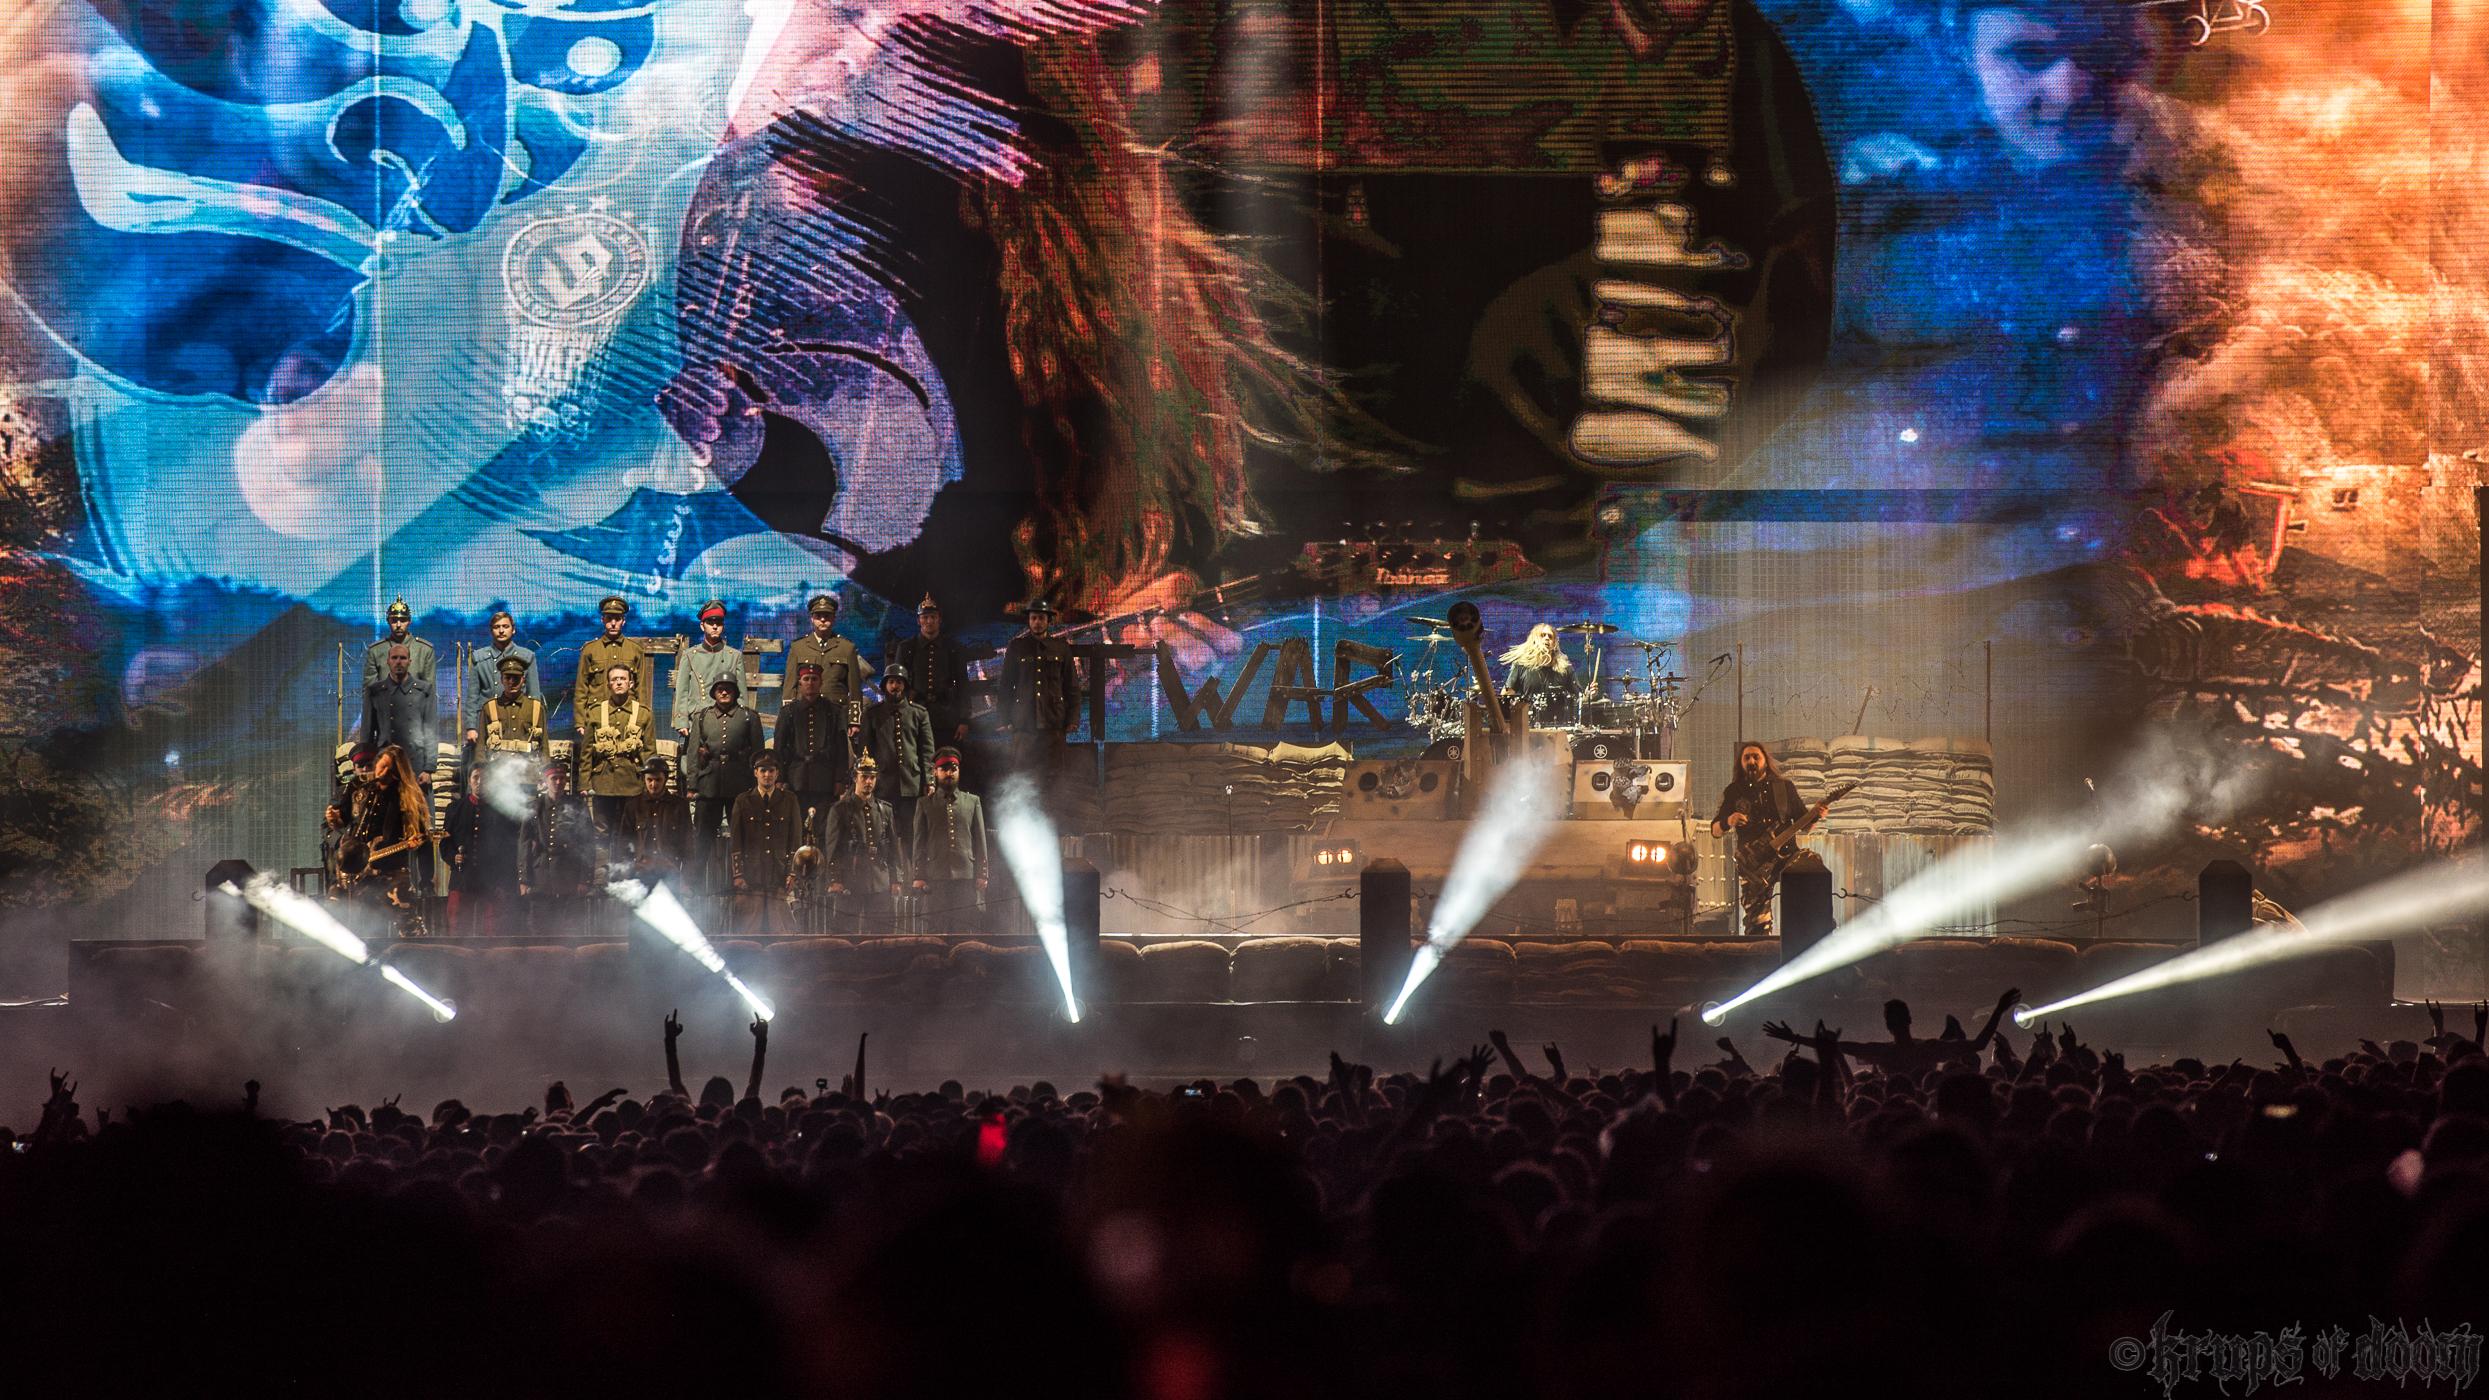 MARDUK - Página 2 Hellfest_2019-Sabaton-Knotfest-5308